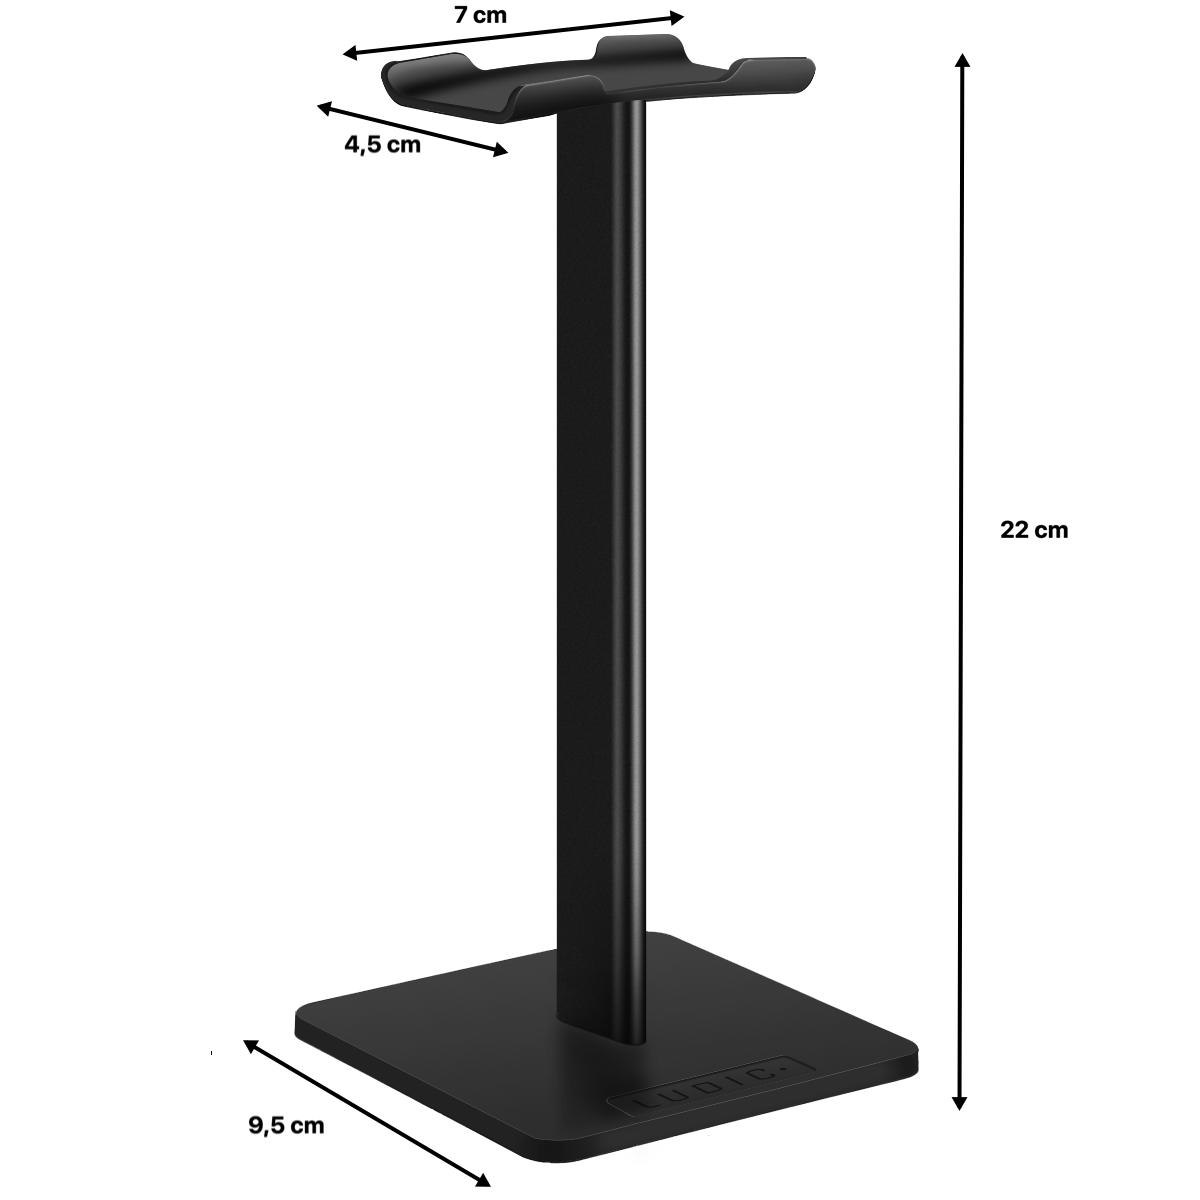 Ludic - Sulla Headphone stand